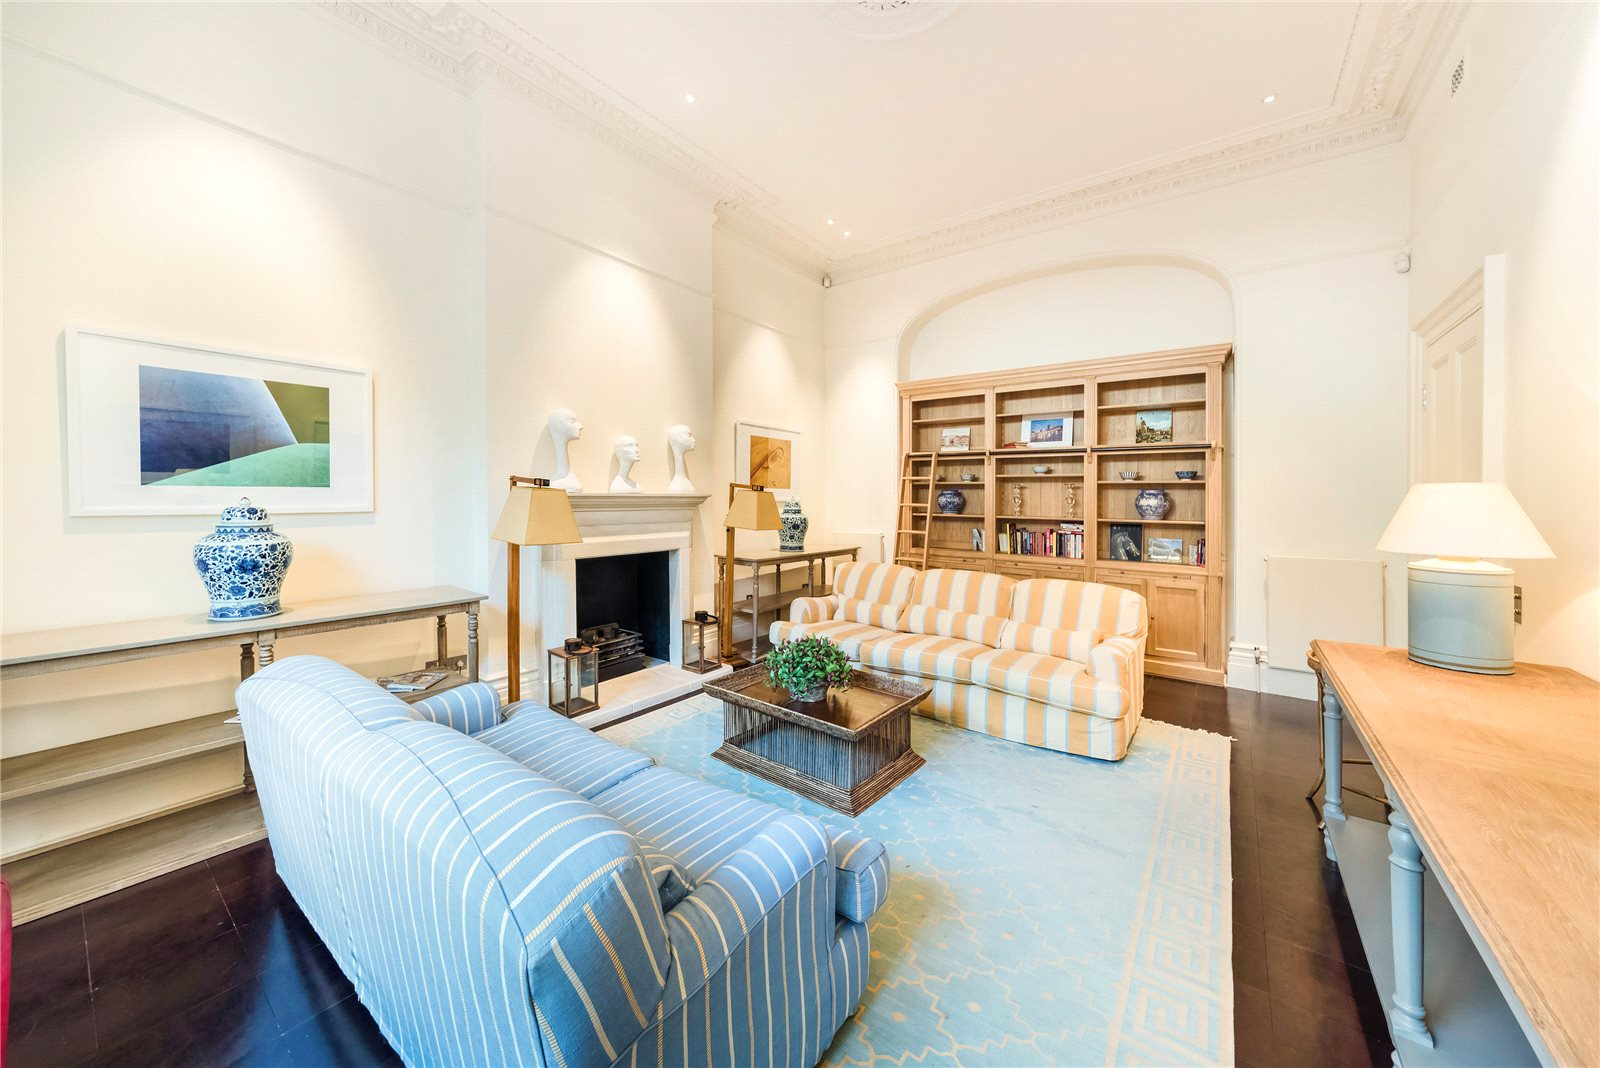 公寓 为 销售 在 Roland Gardens, South Kensington, SW7 South Kensington, 英格兰